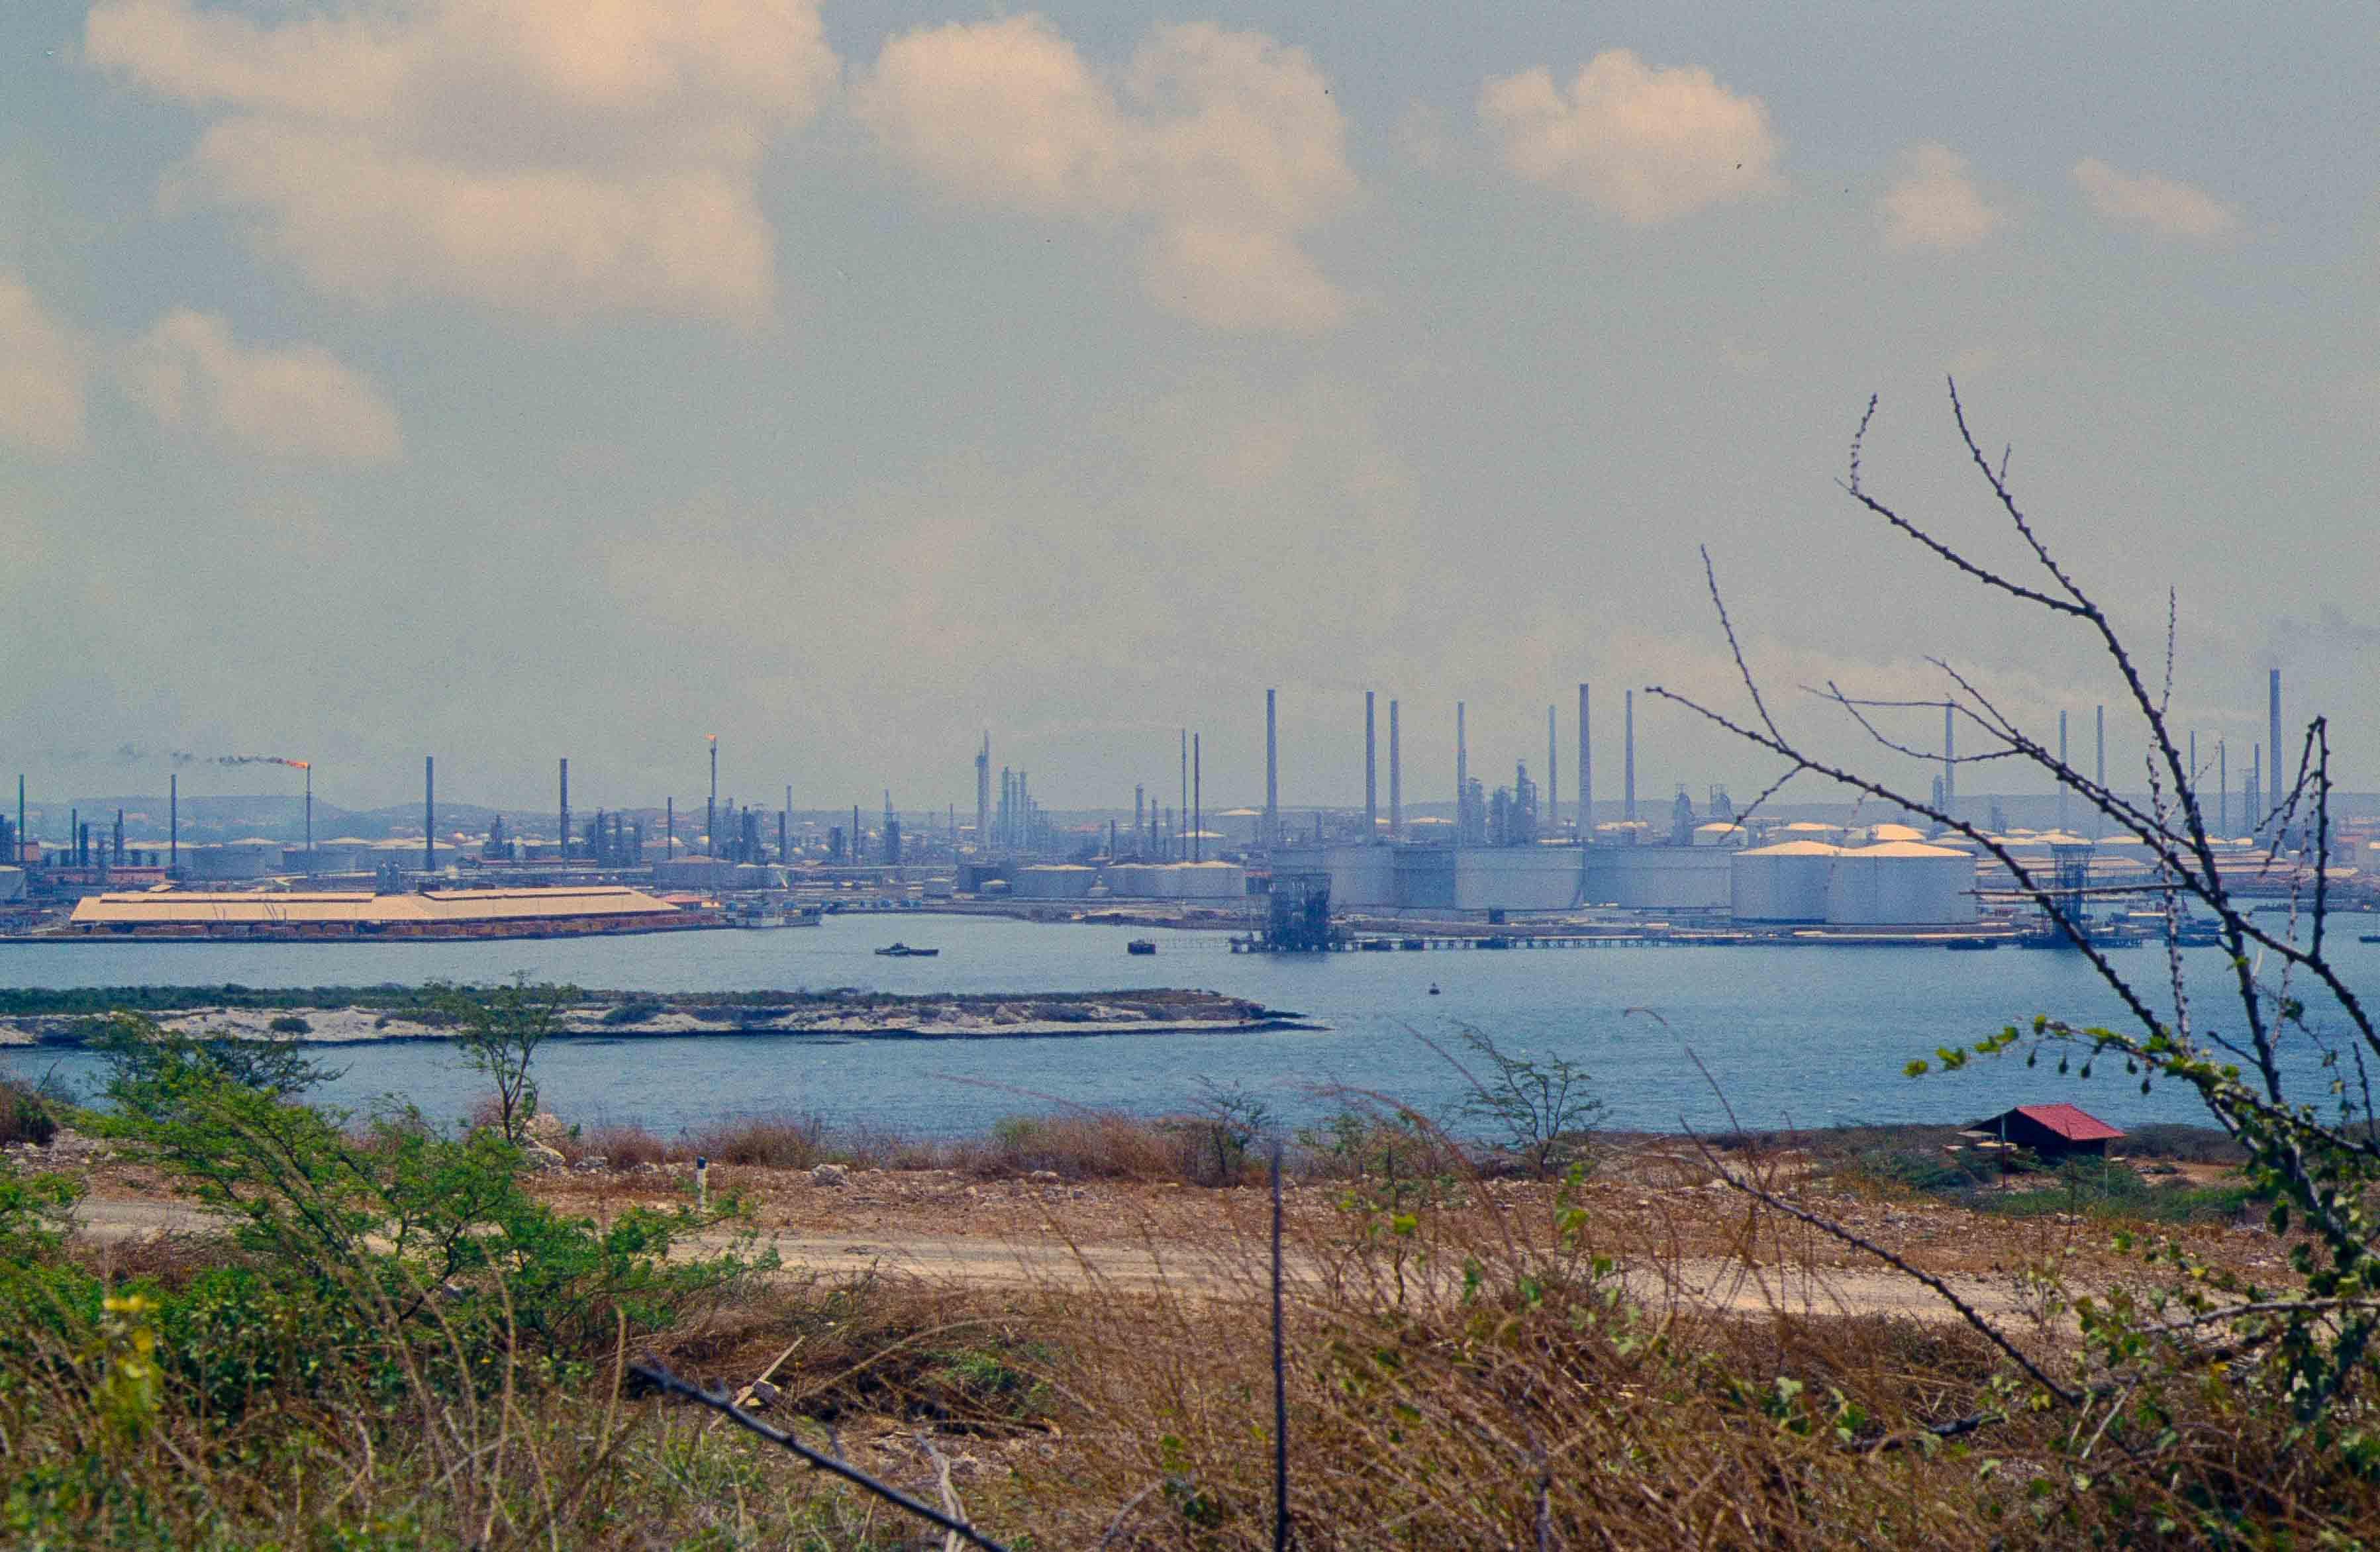 635. Suriname